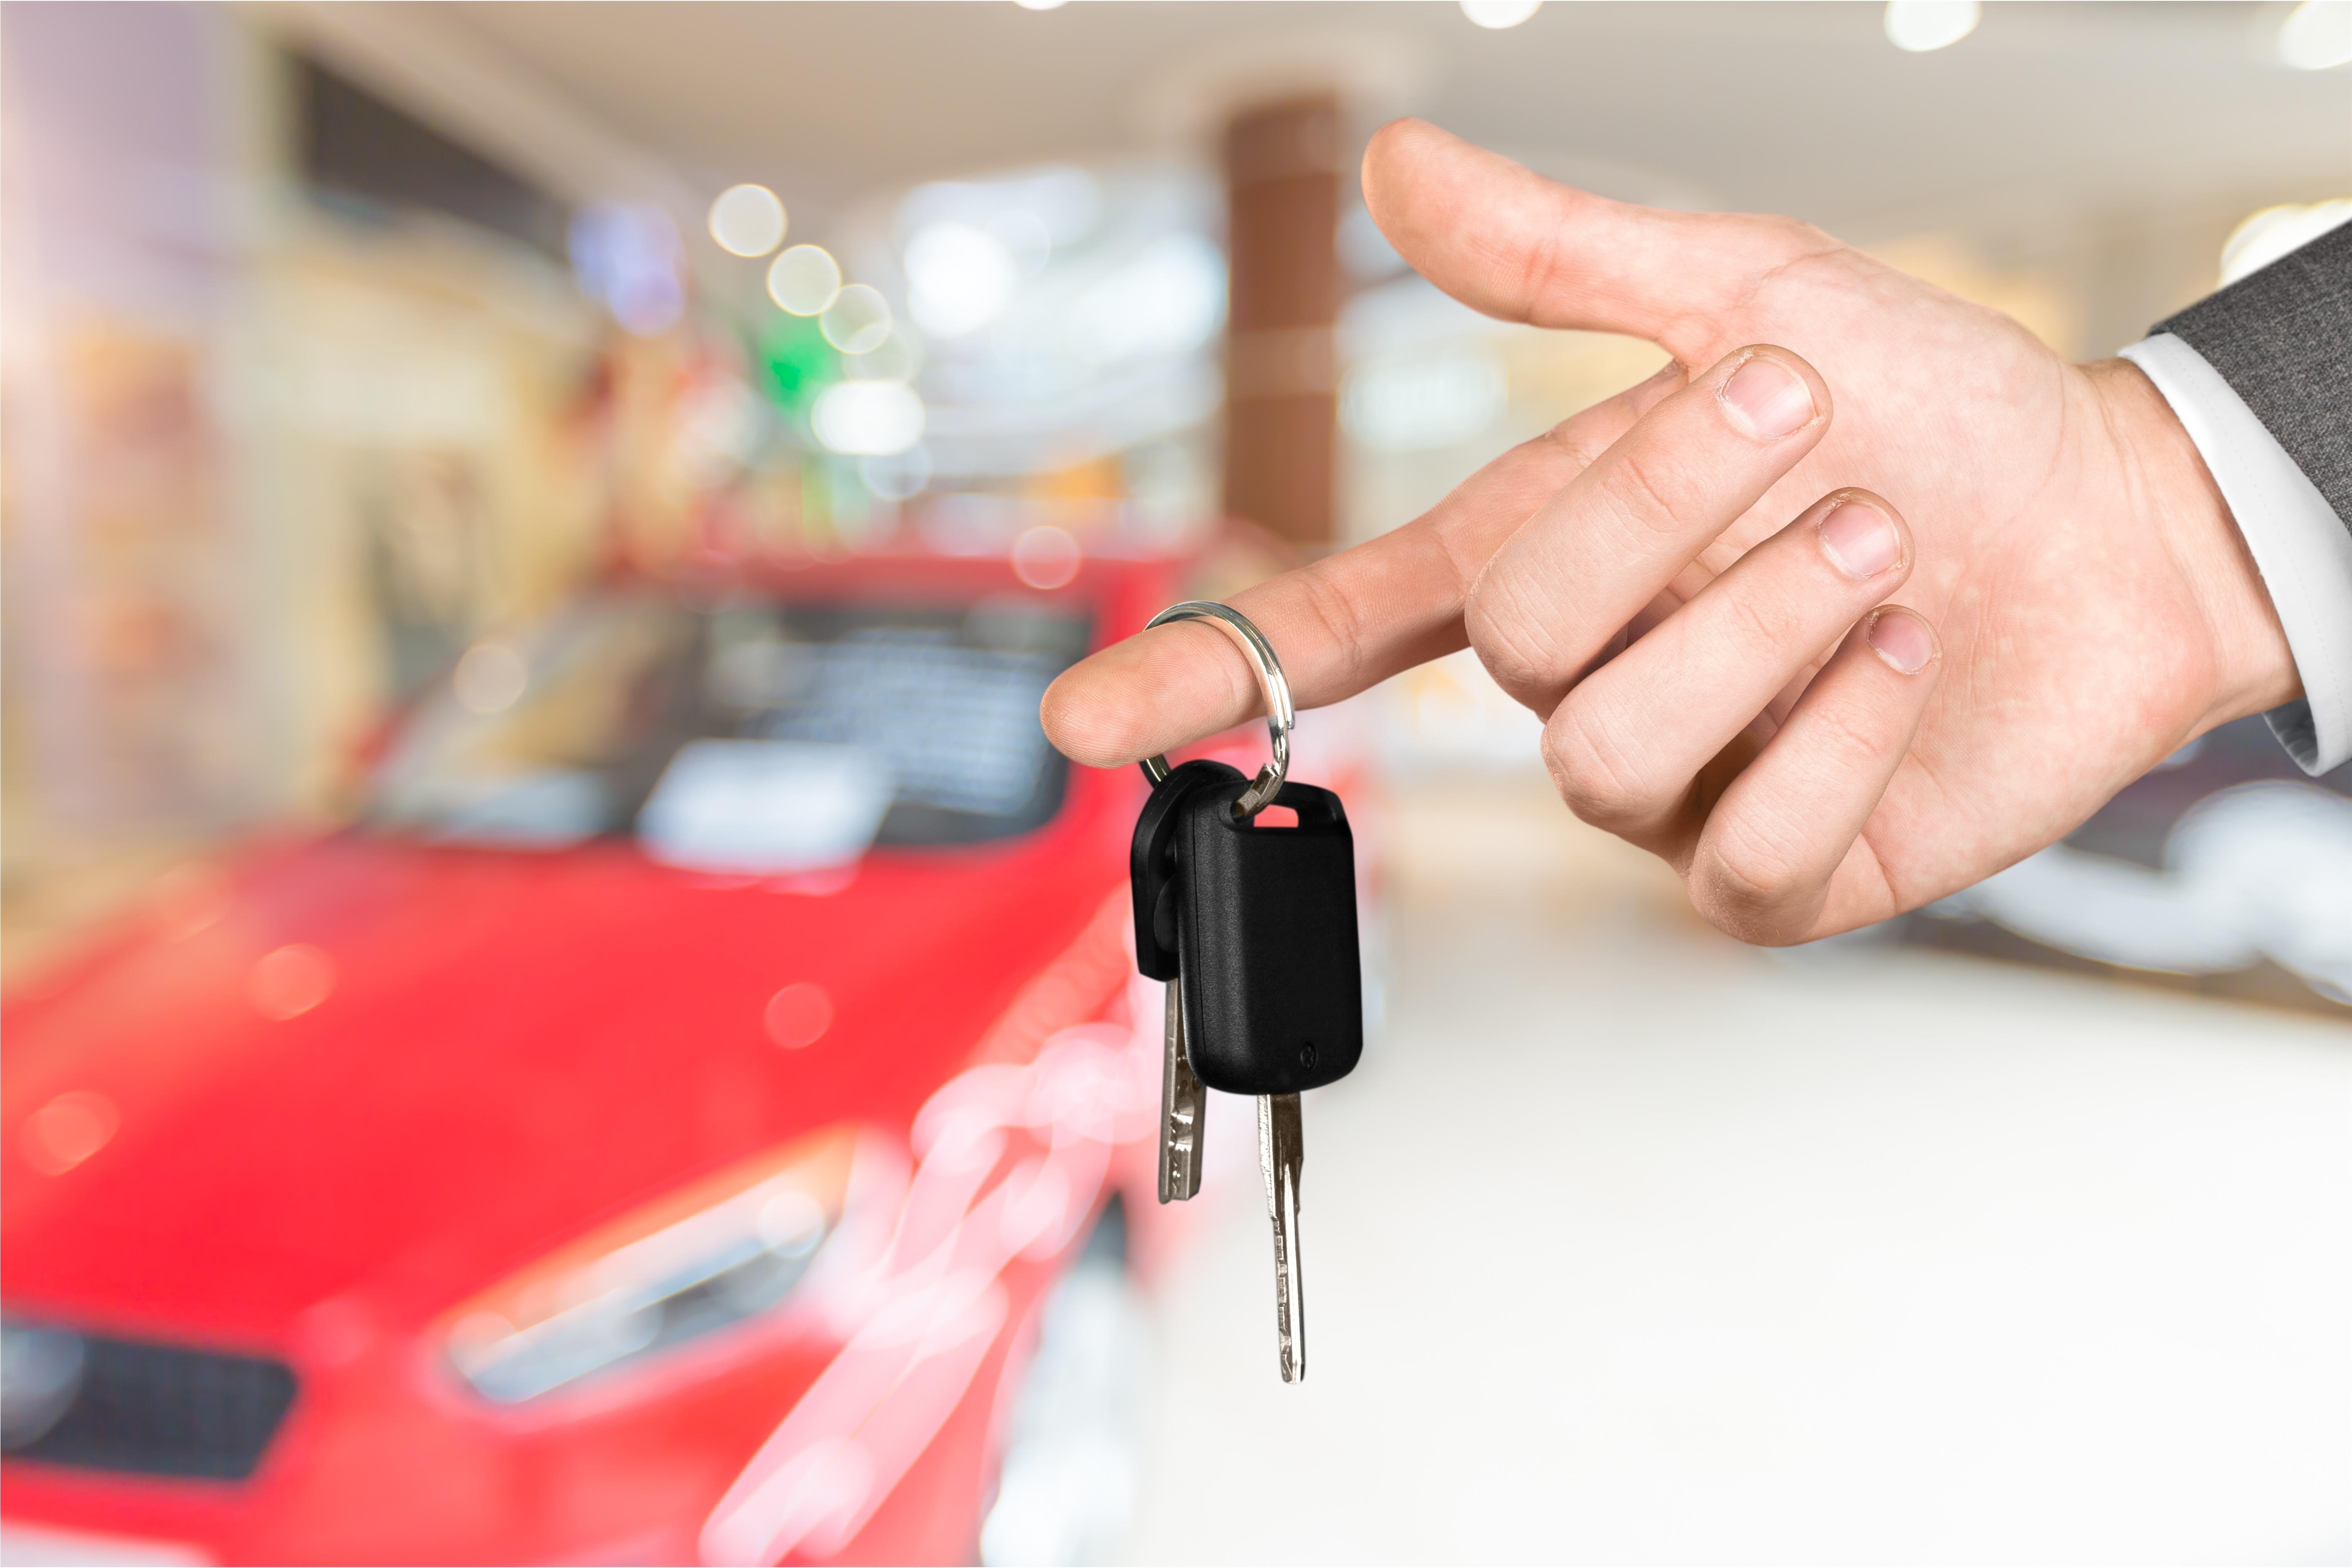 Hvis du mangler en ny bil, så vælg en Suzuki / Suzuki forhandler